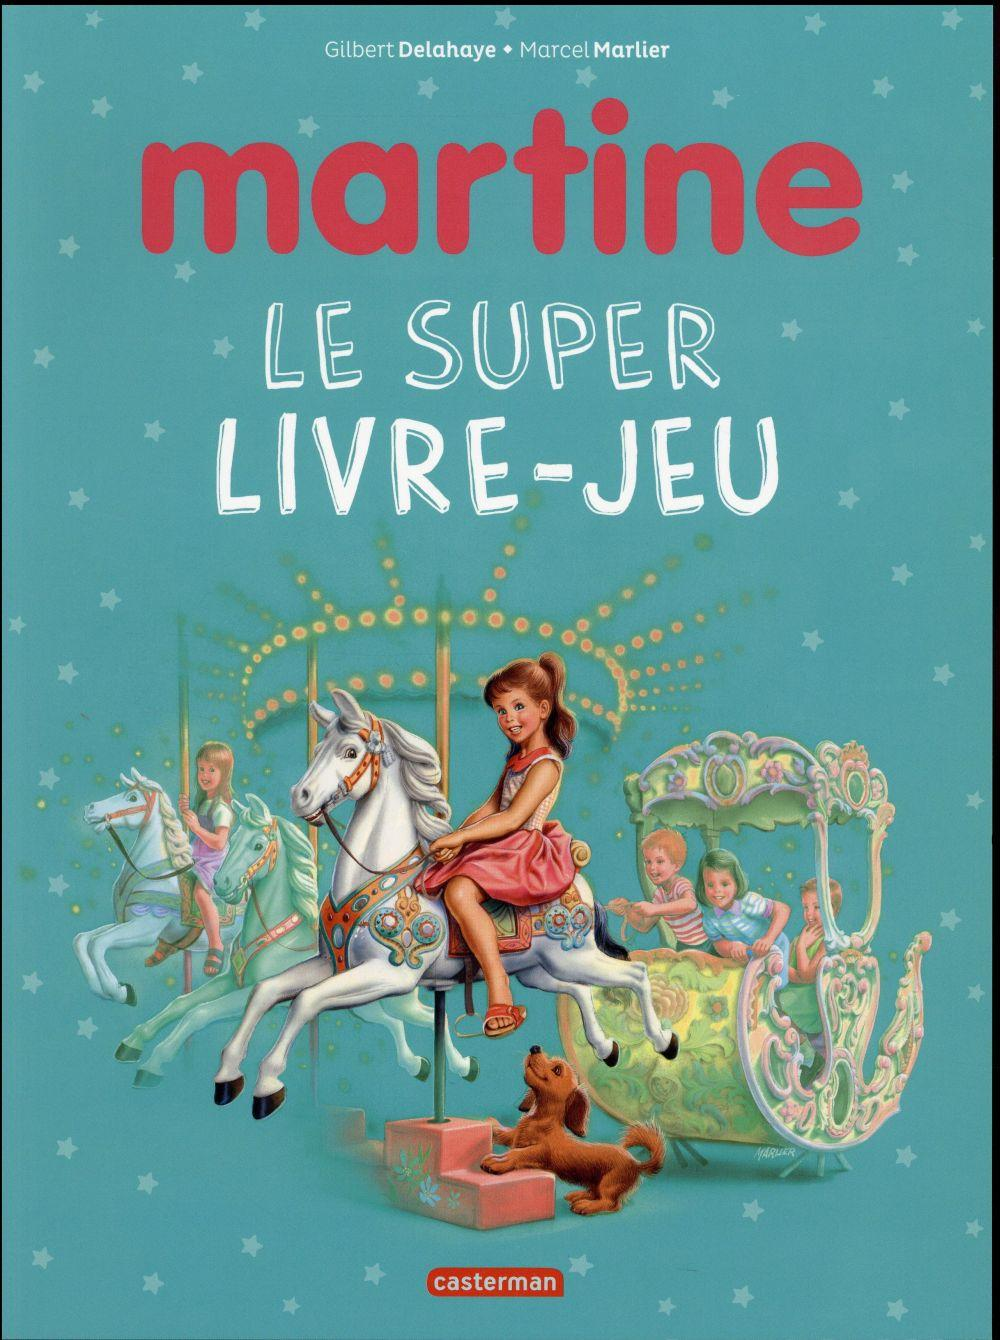 Martine Le Super Livre Jeu